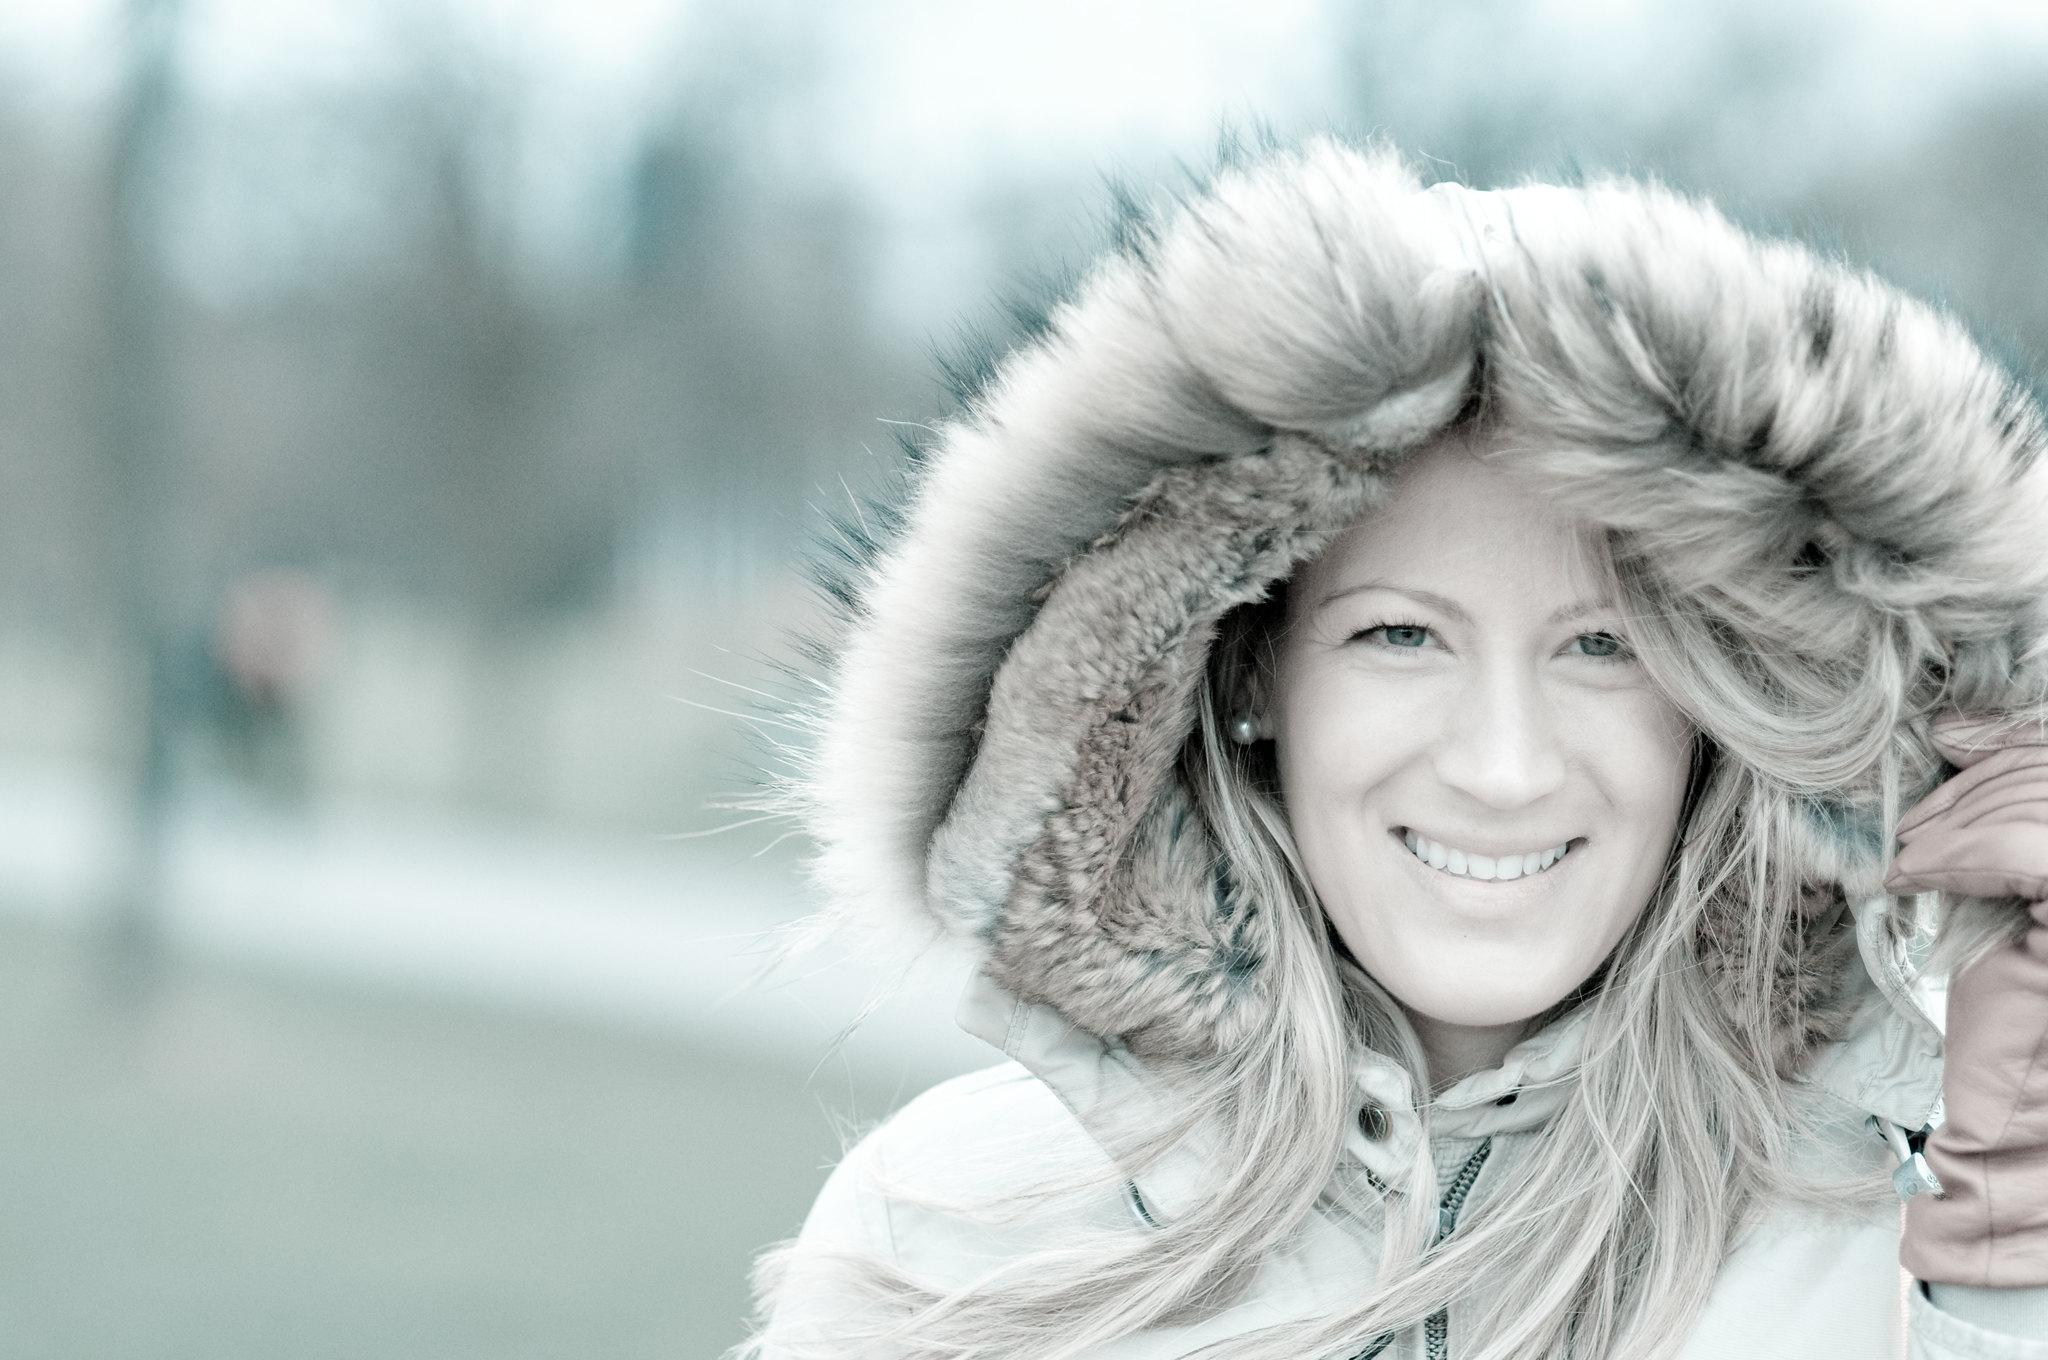 Warm in cold tones